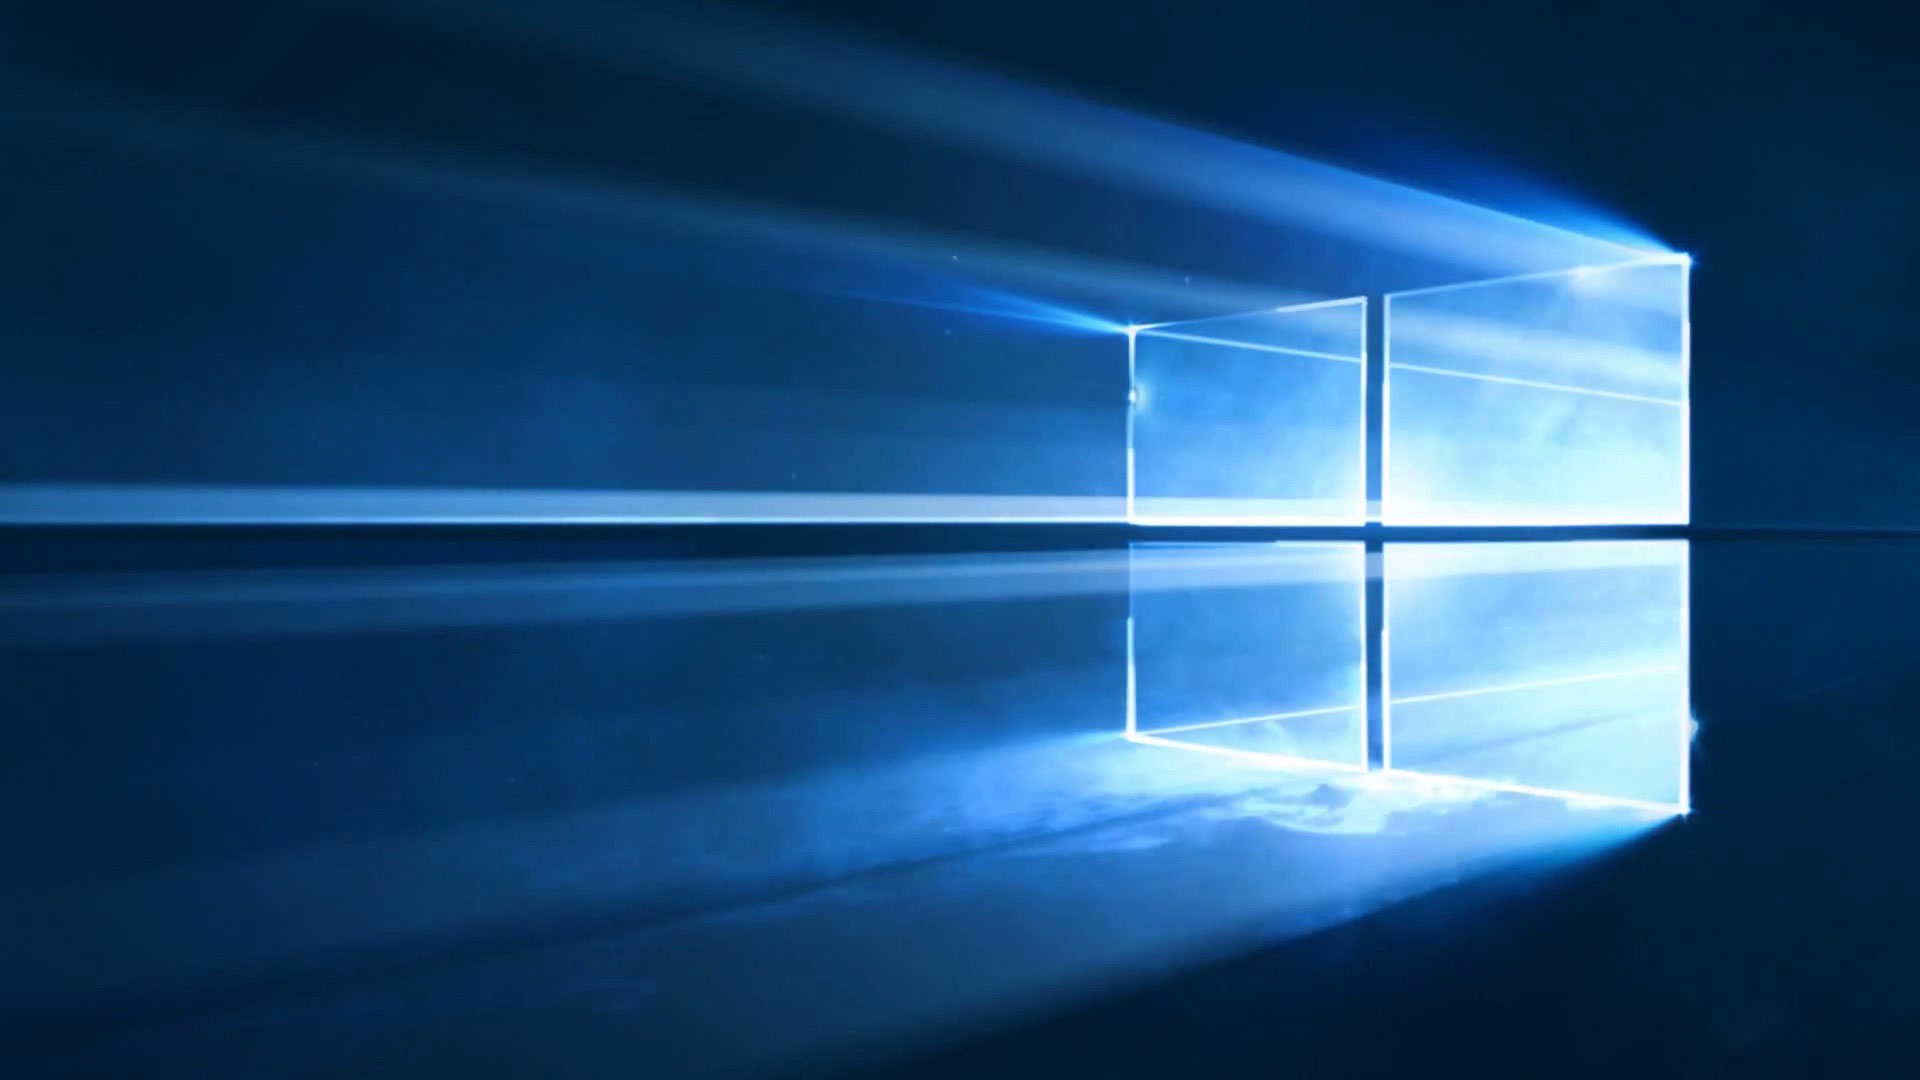 Quelle: Microsoft.com